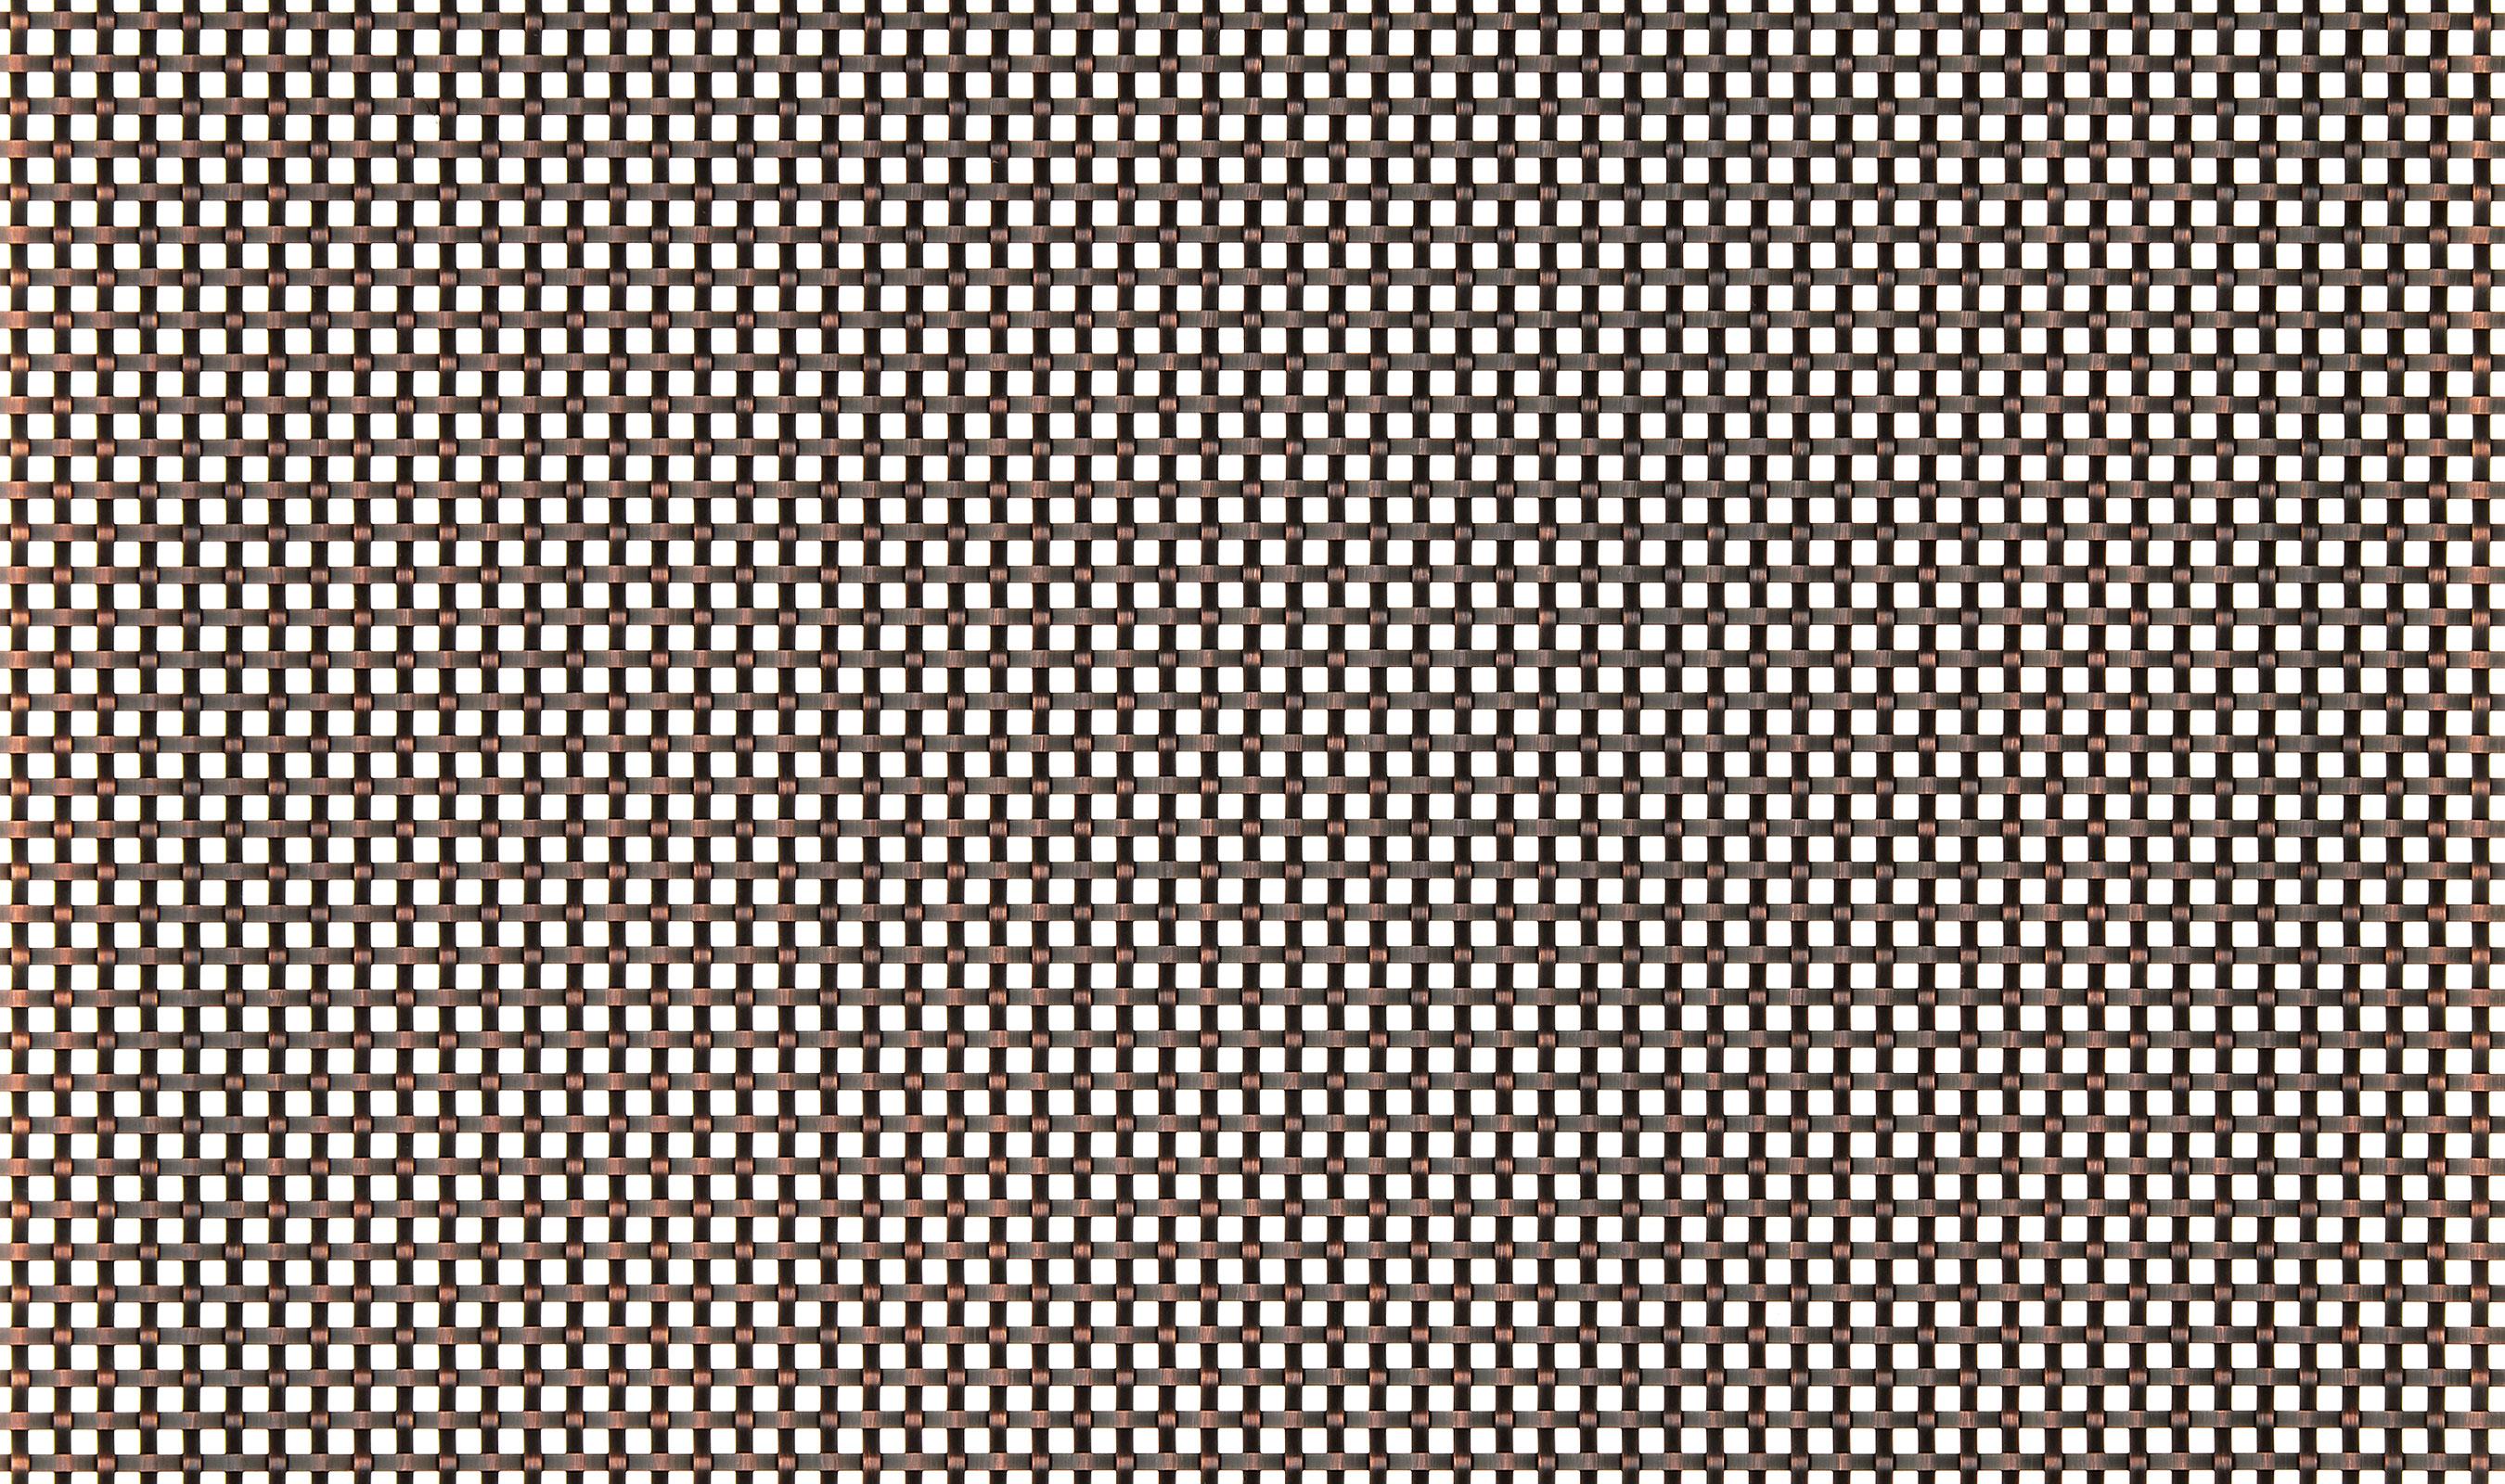 S-32 Black Copper Plated wire mesh